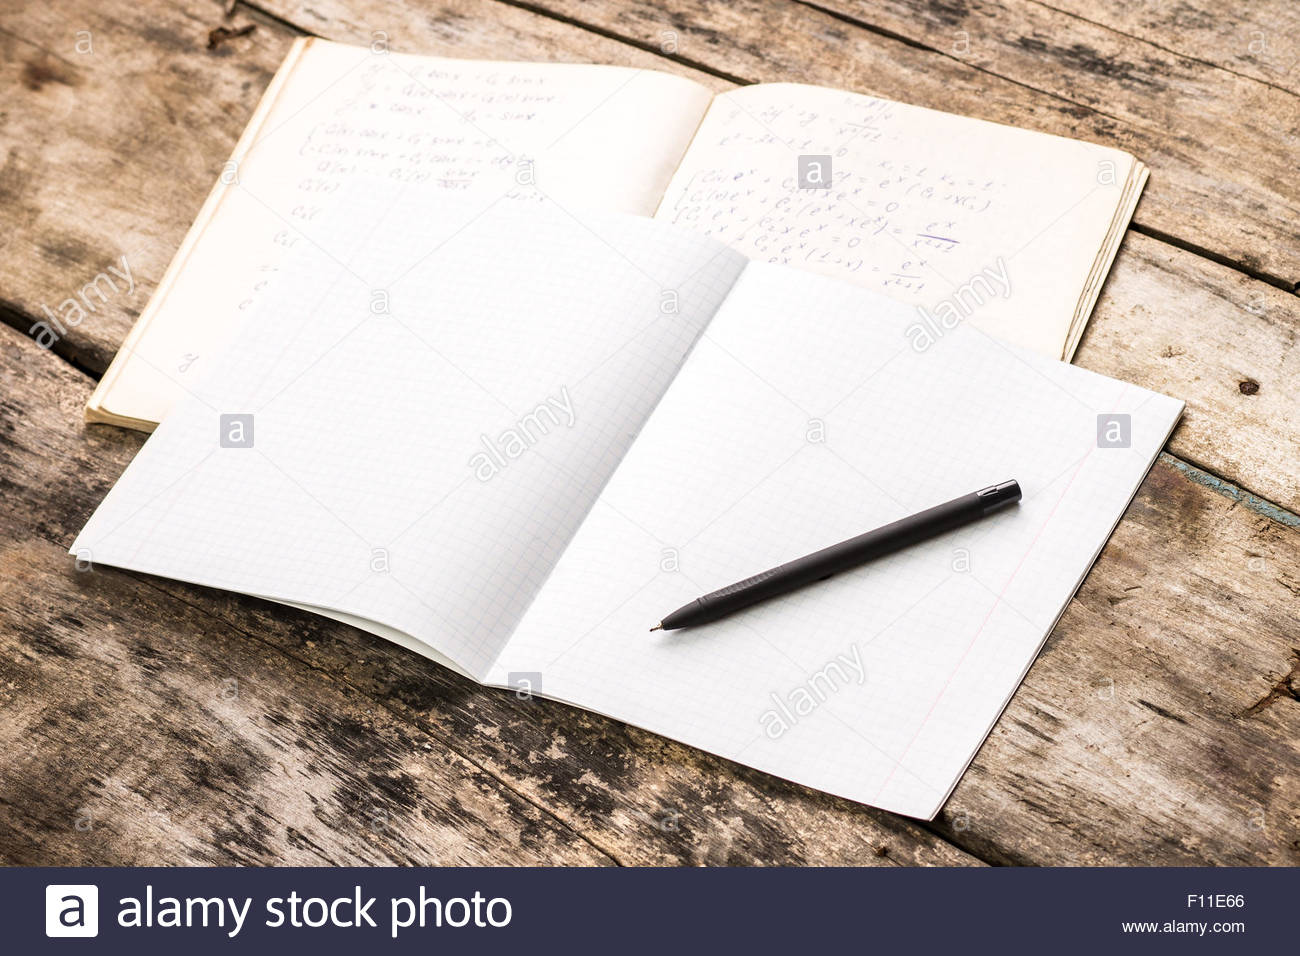 Open notebook with pen Mathematics homework school background 1300x956